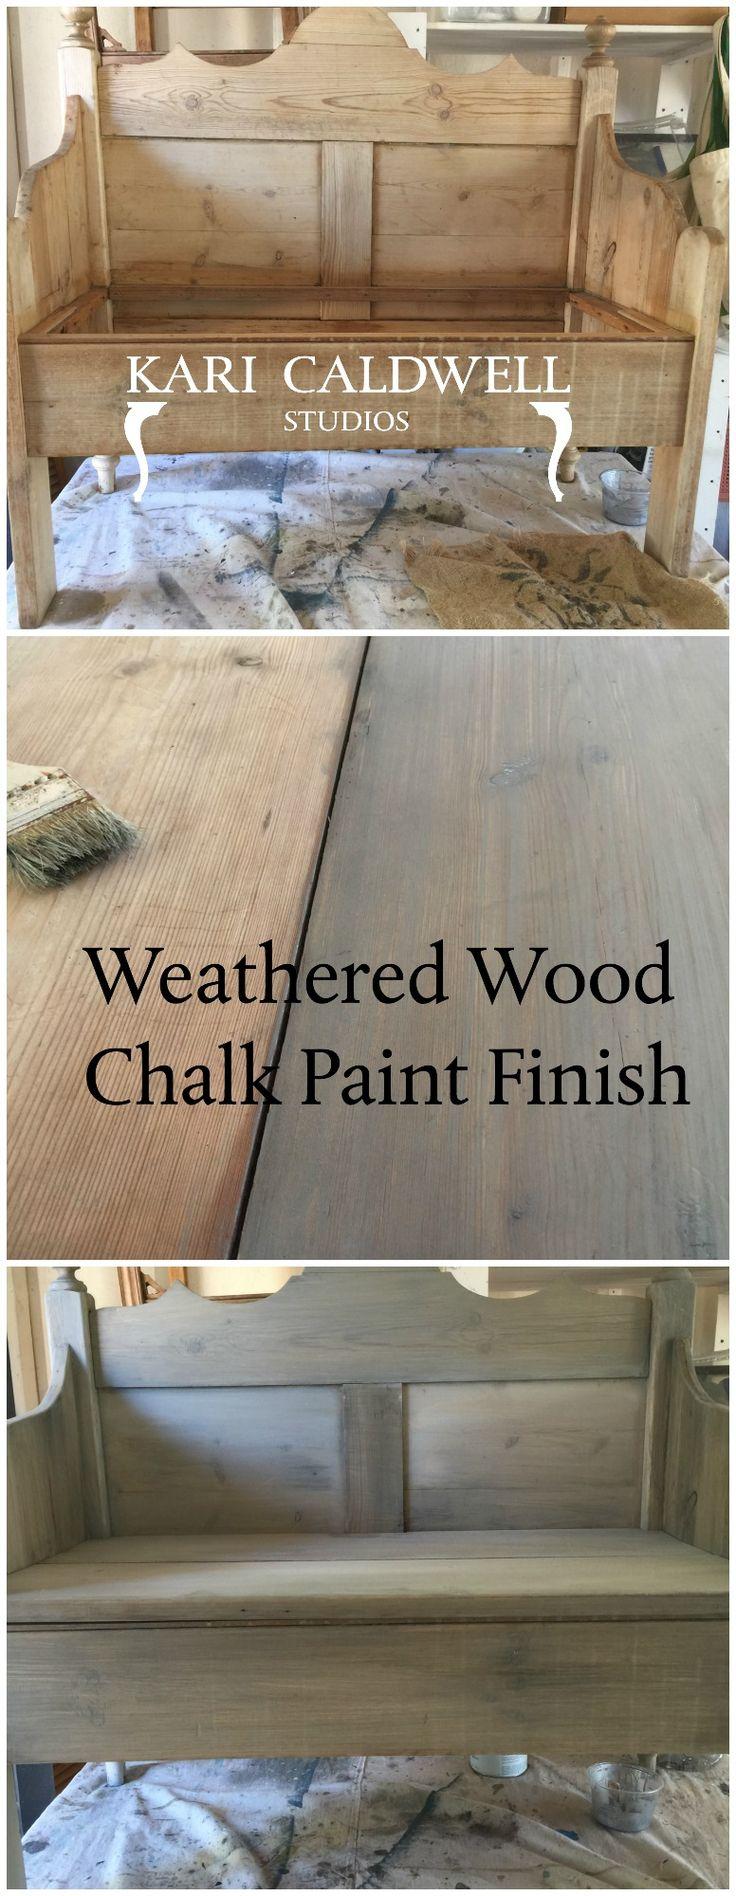 Create Driftwood On Raw Wood Annie Sloan Chalk Paint In 2019 Raw Wood Driftwood Furniture